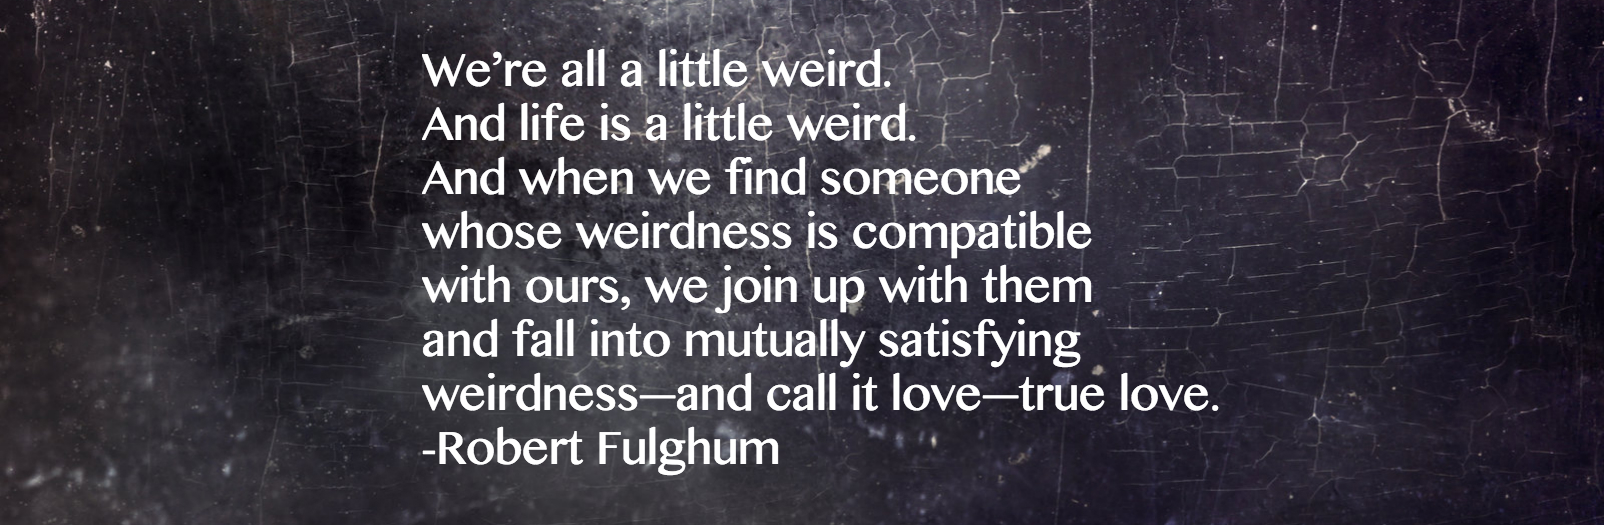 We're all a little wierd